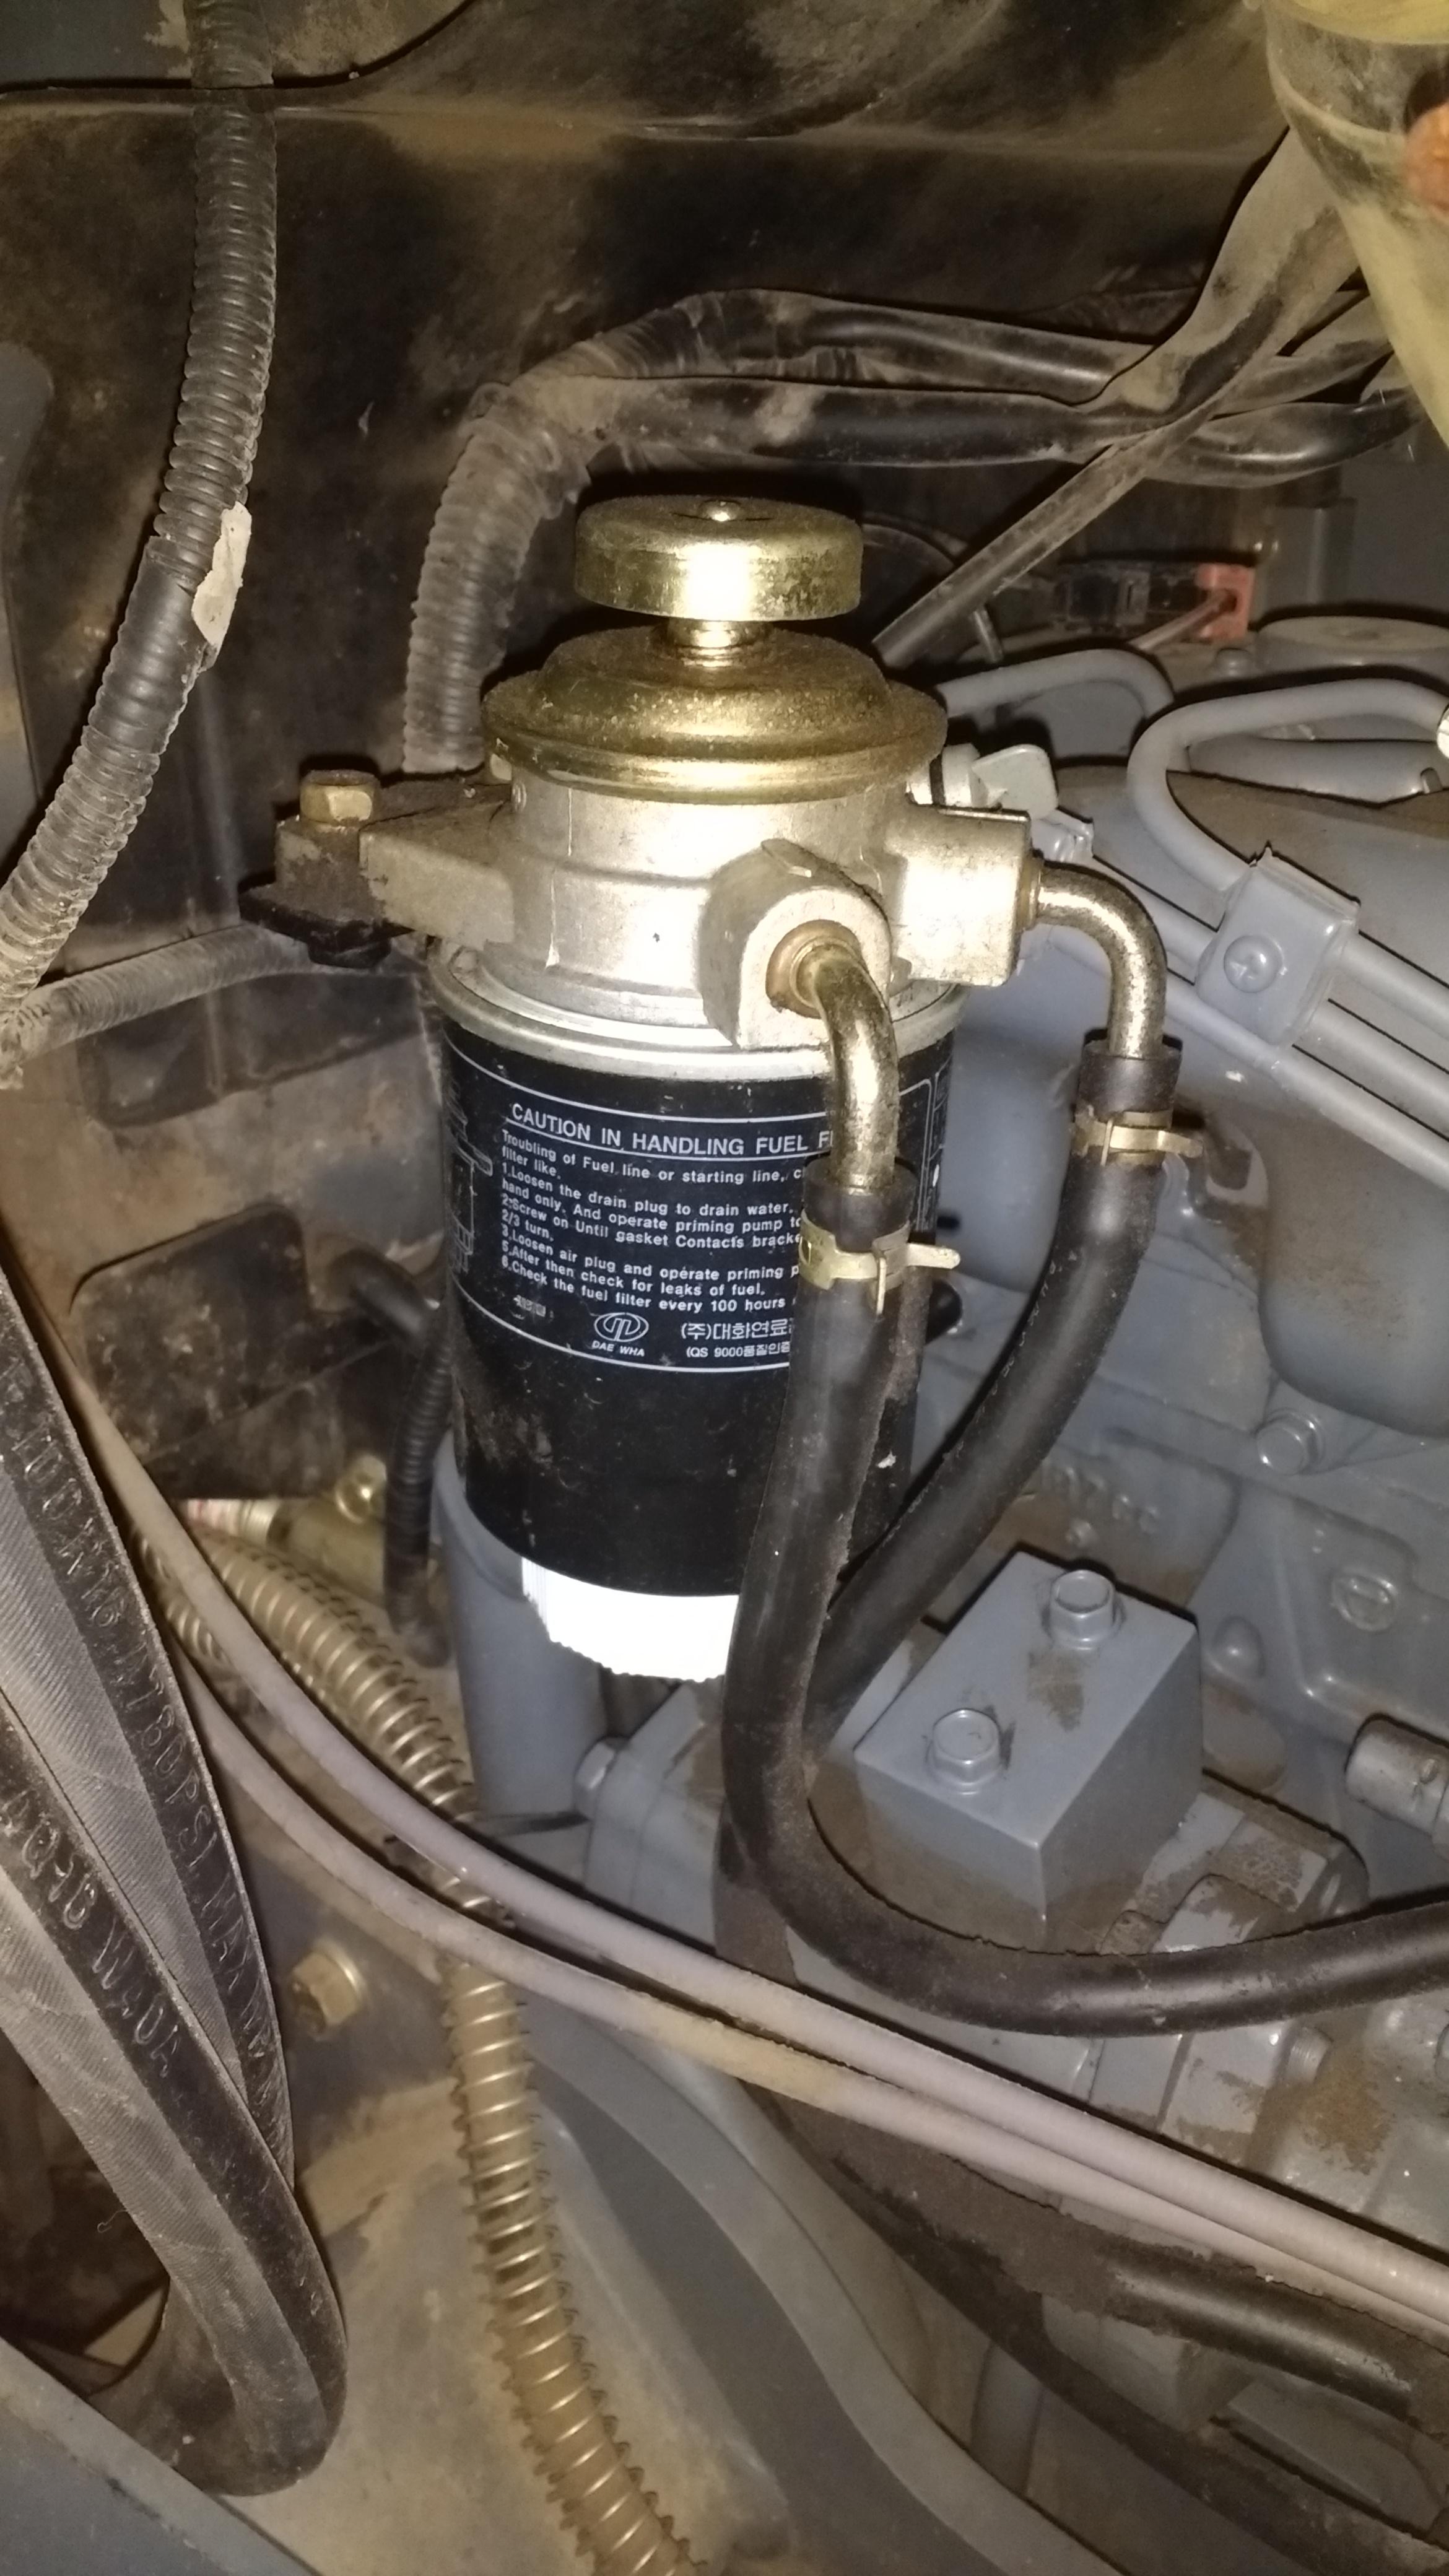 [DIAGRAM_5UK]  XX_6728] Dixie Chopper Fuel Filter Download Diagram | Trs21 Snowblower Parts Fuel Filter |  | Dome Subc Oper Lite Pap Mohammedshrine Librar Wiring 101